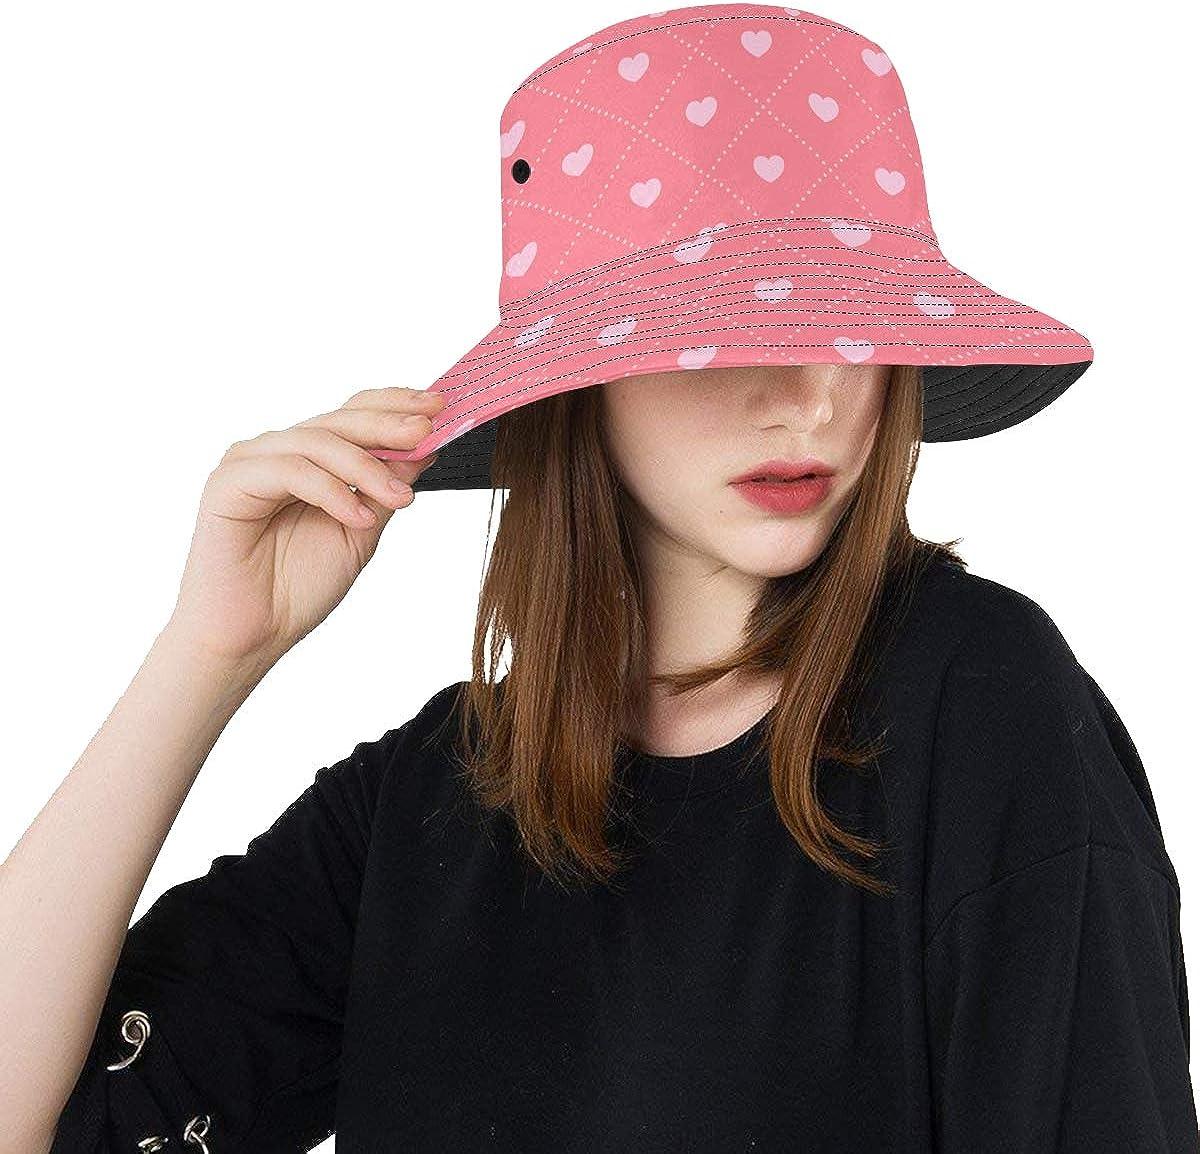 Love Shape Heart Summer Unisex Fishing Sun Top Bucket Hats for Kid Teens Women and Men with Packable Fisherman Cap for Outdoor Baseball Sport Picnic